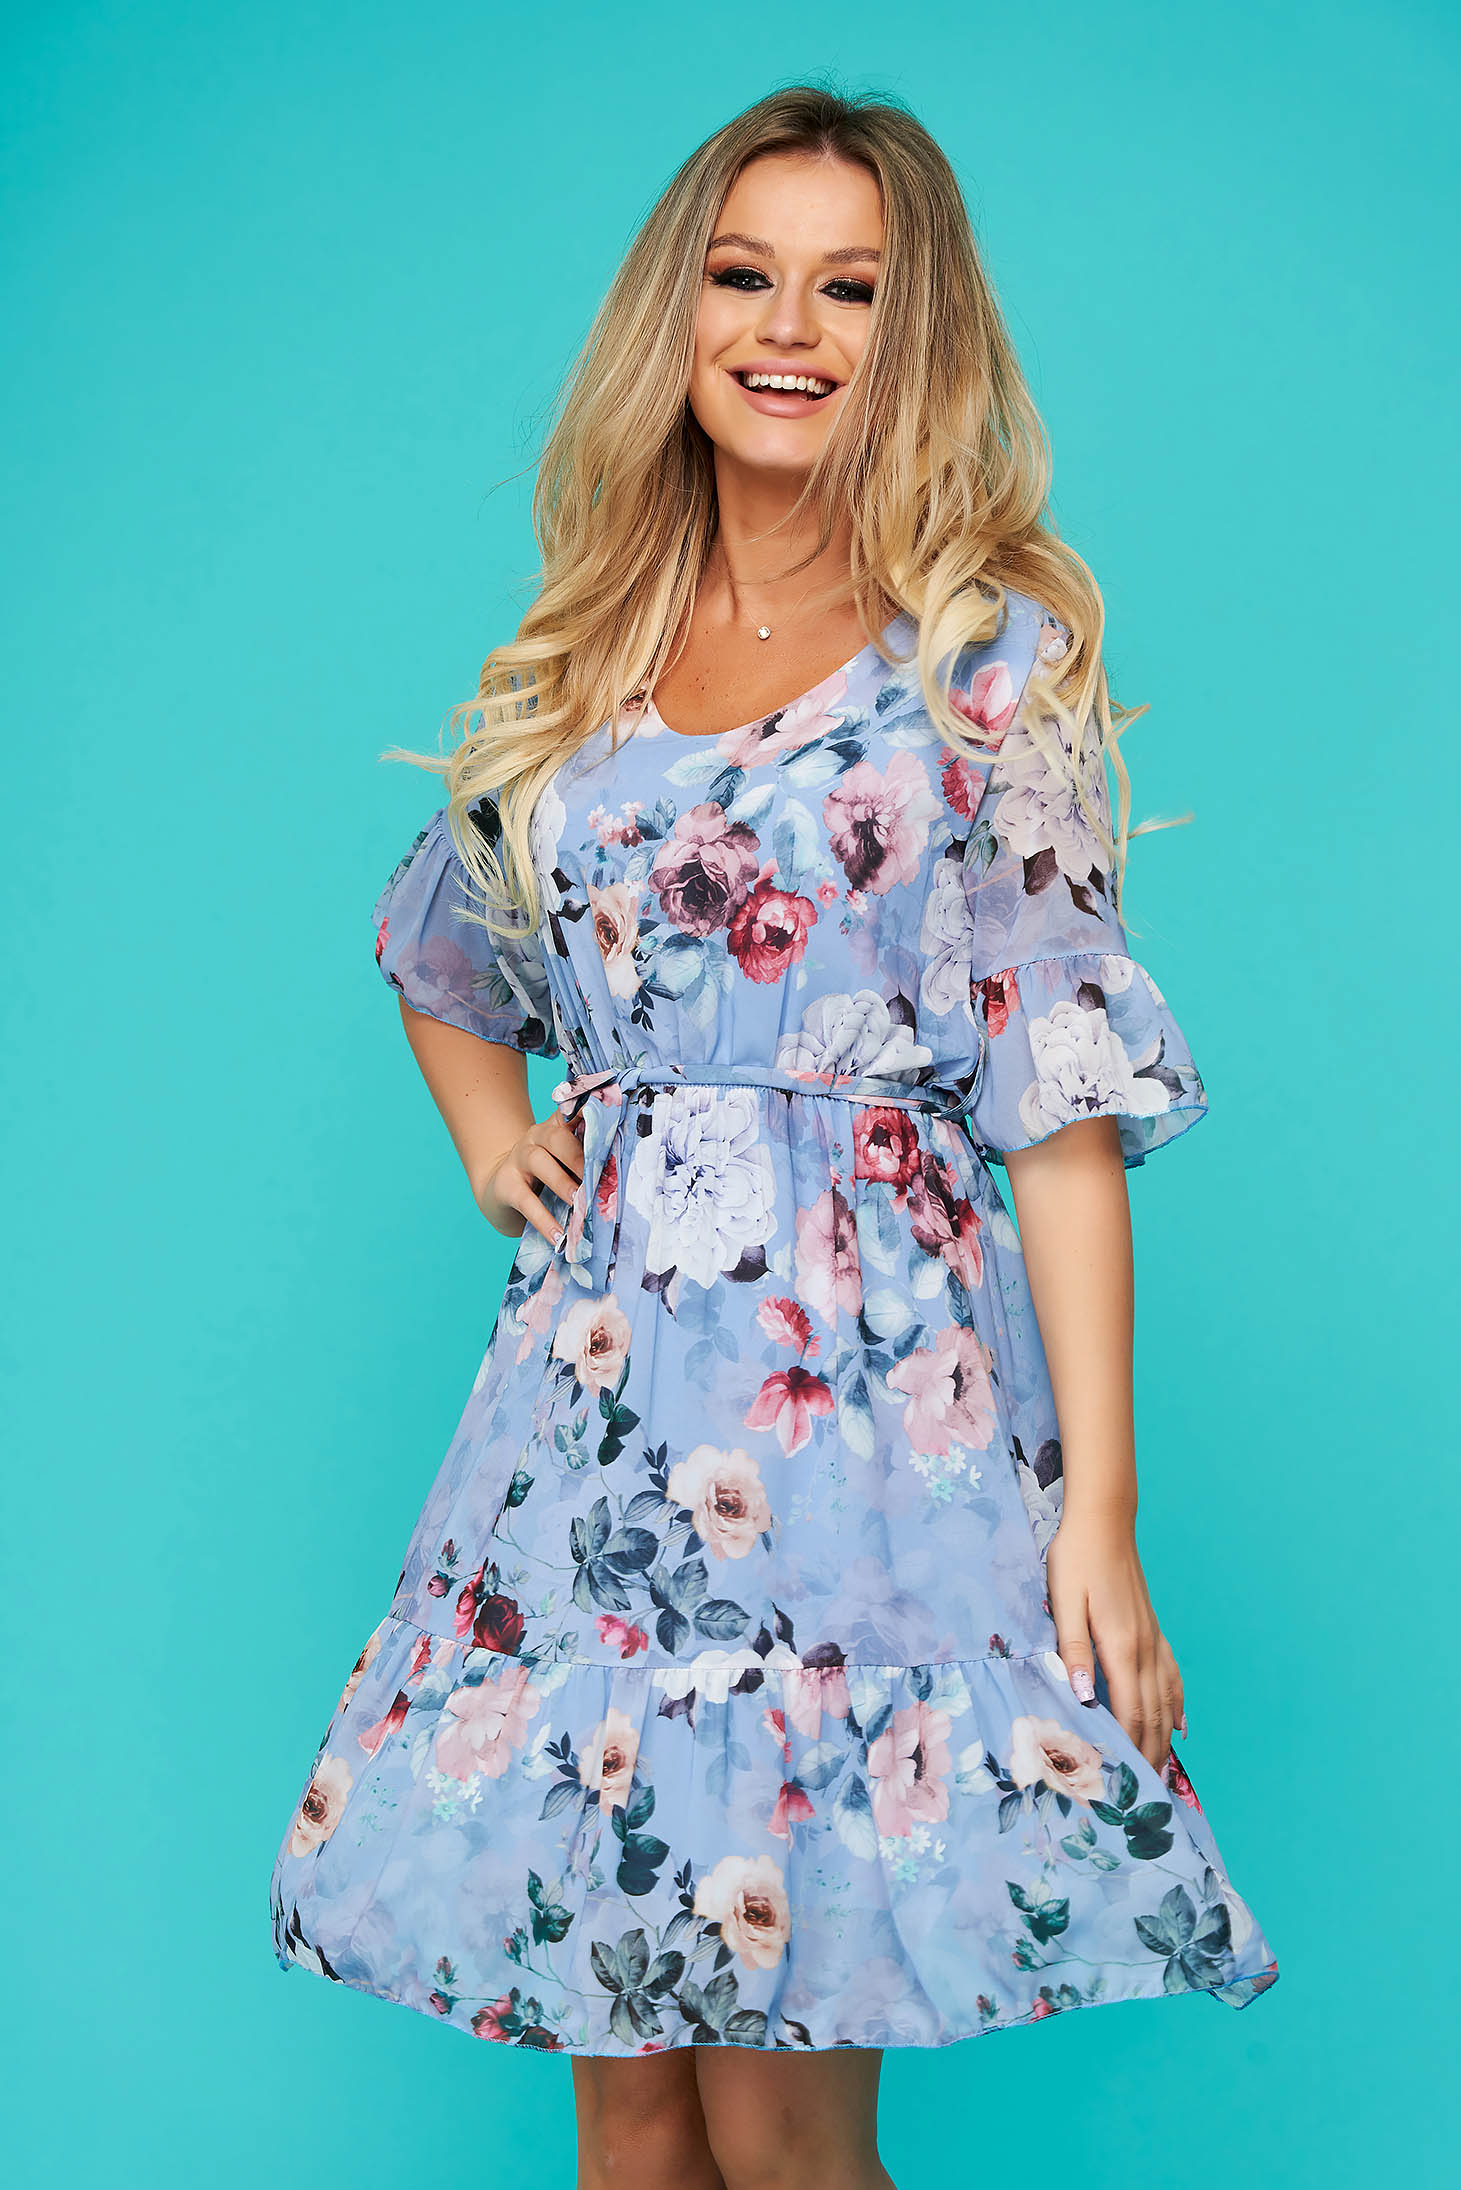 Lightblue dress short cut daily airy fabric cloche with elastic waist